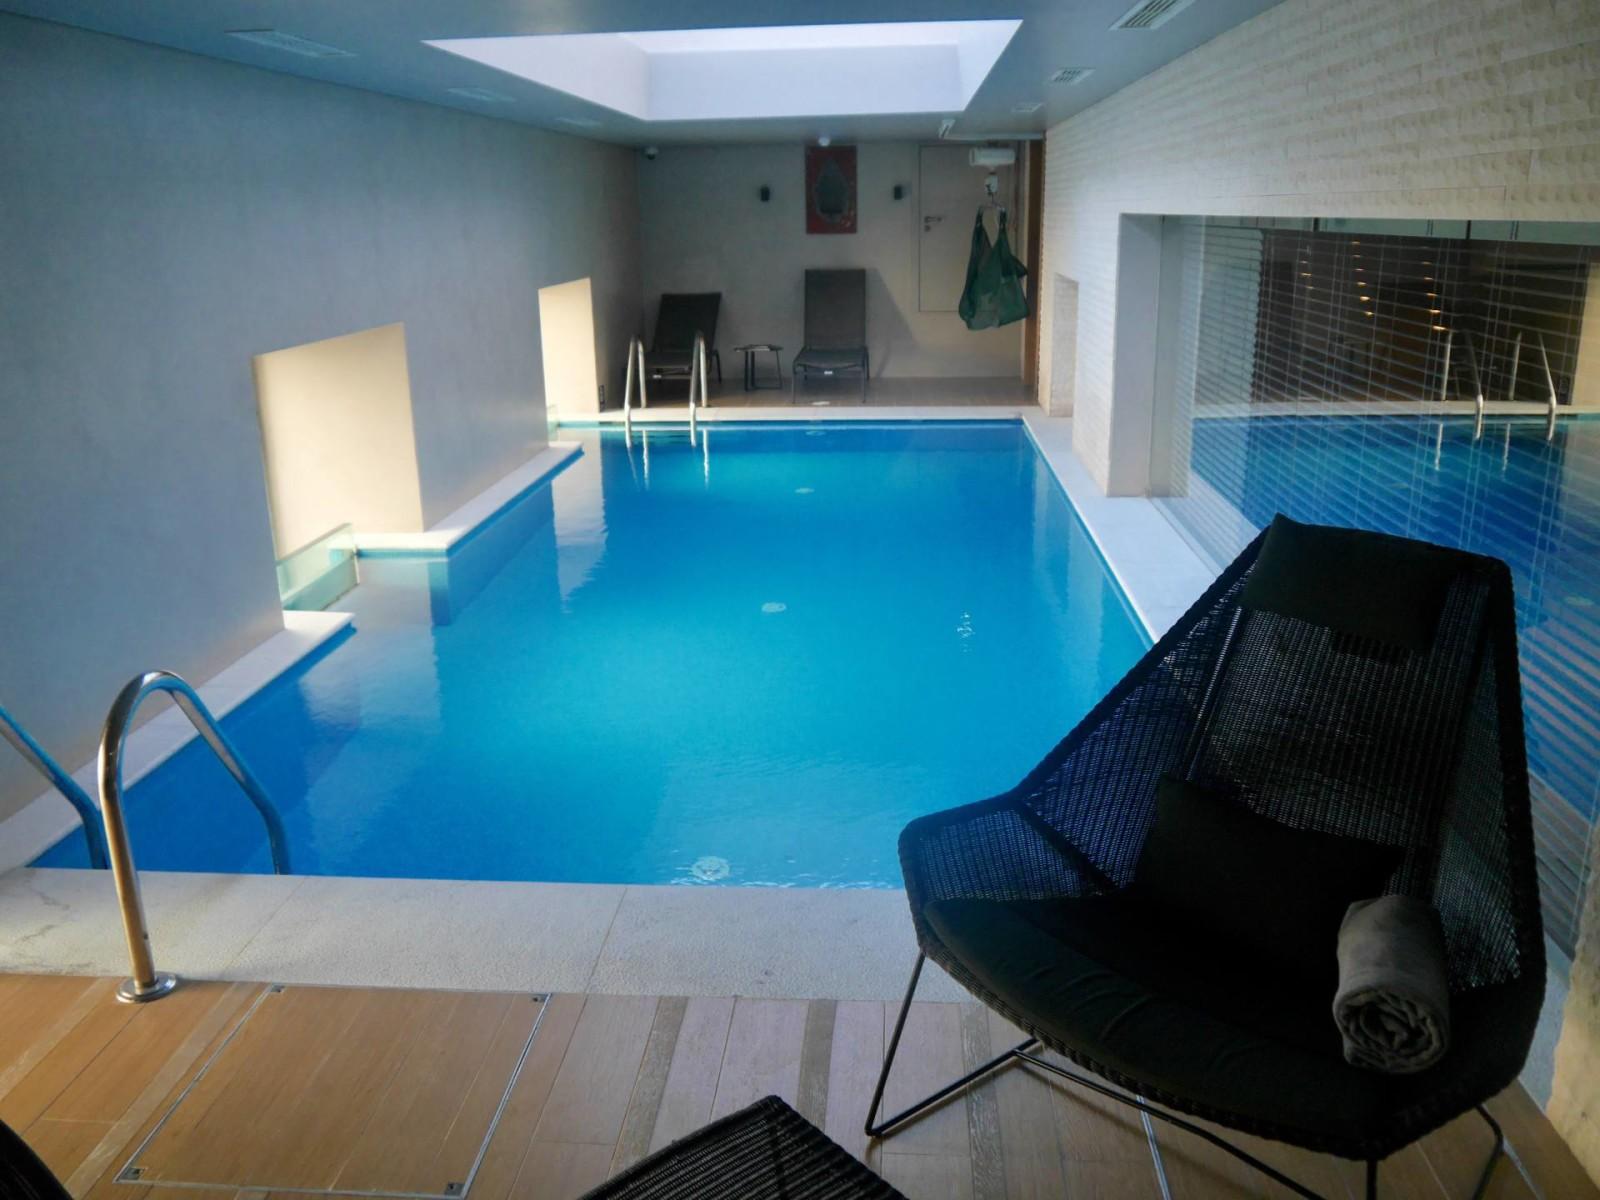 Pousada de lisboa lisbon hotel review for Lisbon boutique hotel swimming pool